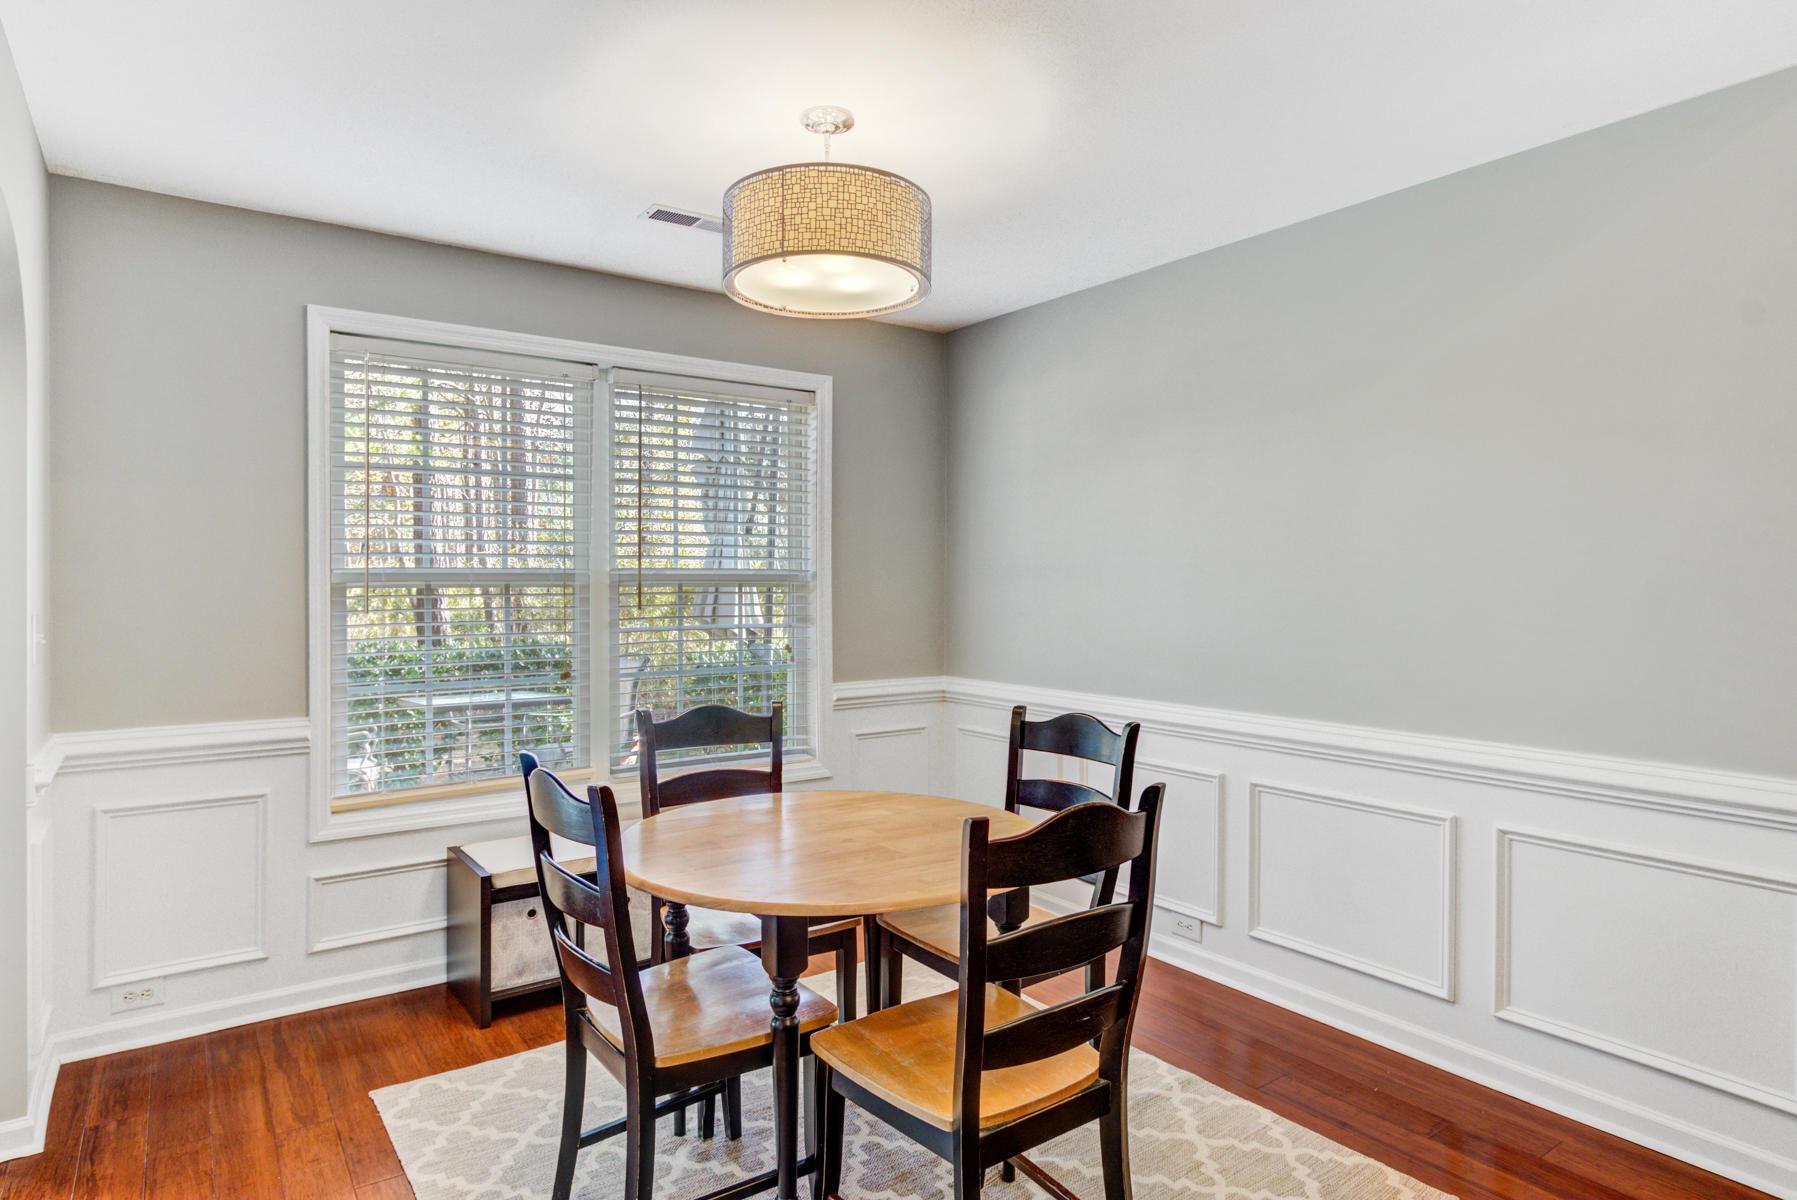 Park West Homes For Sale - 3444 Wellesley, Mount Pleasant, SC - 20